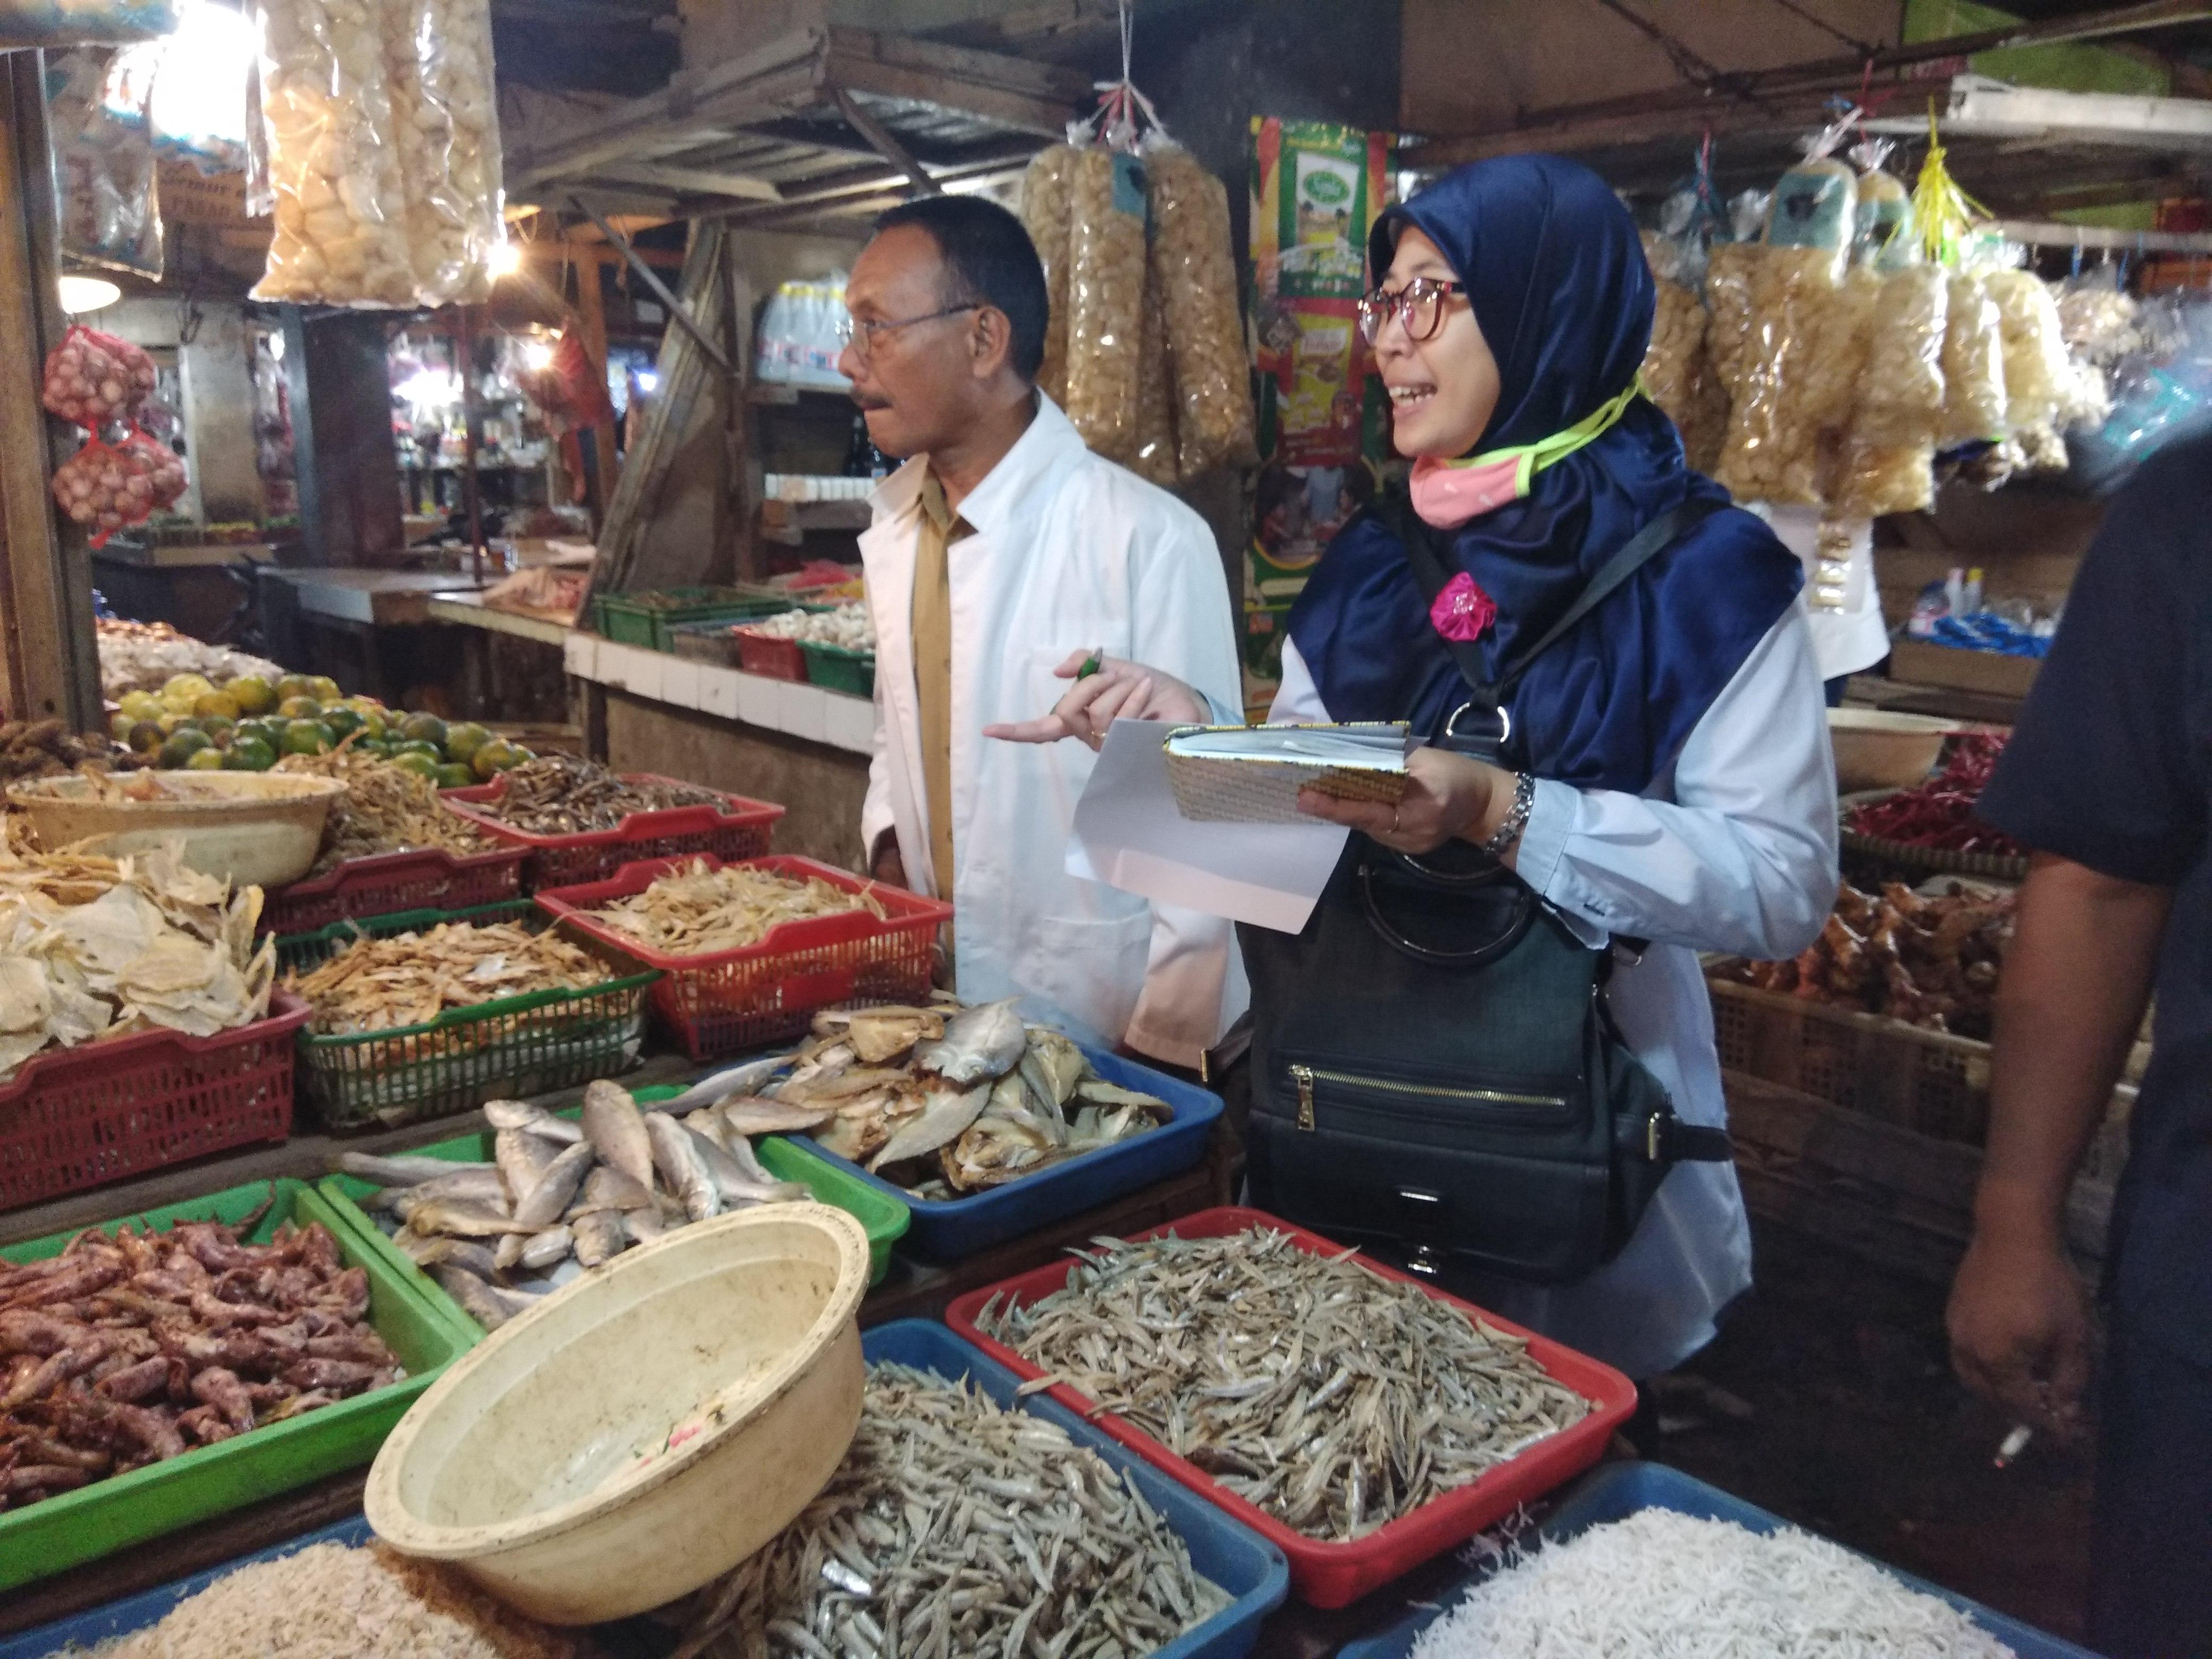 Uji Keamanan Pangan yang dilakukan oleh Dinas Ketahanan Pangan di Pasar Bojonggede